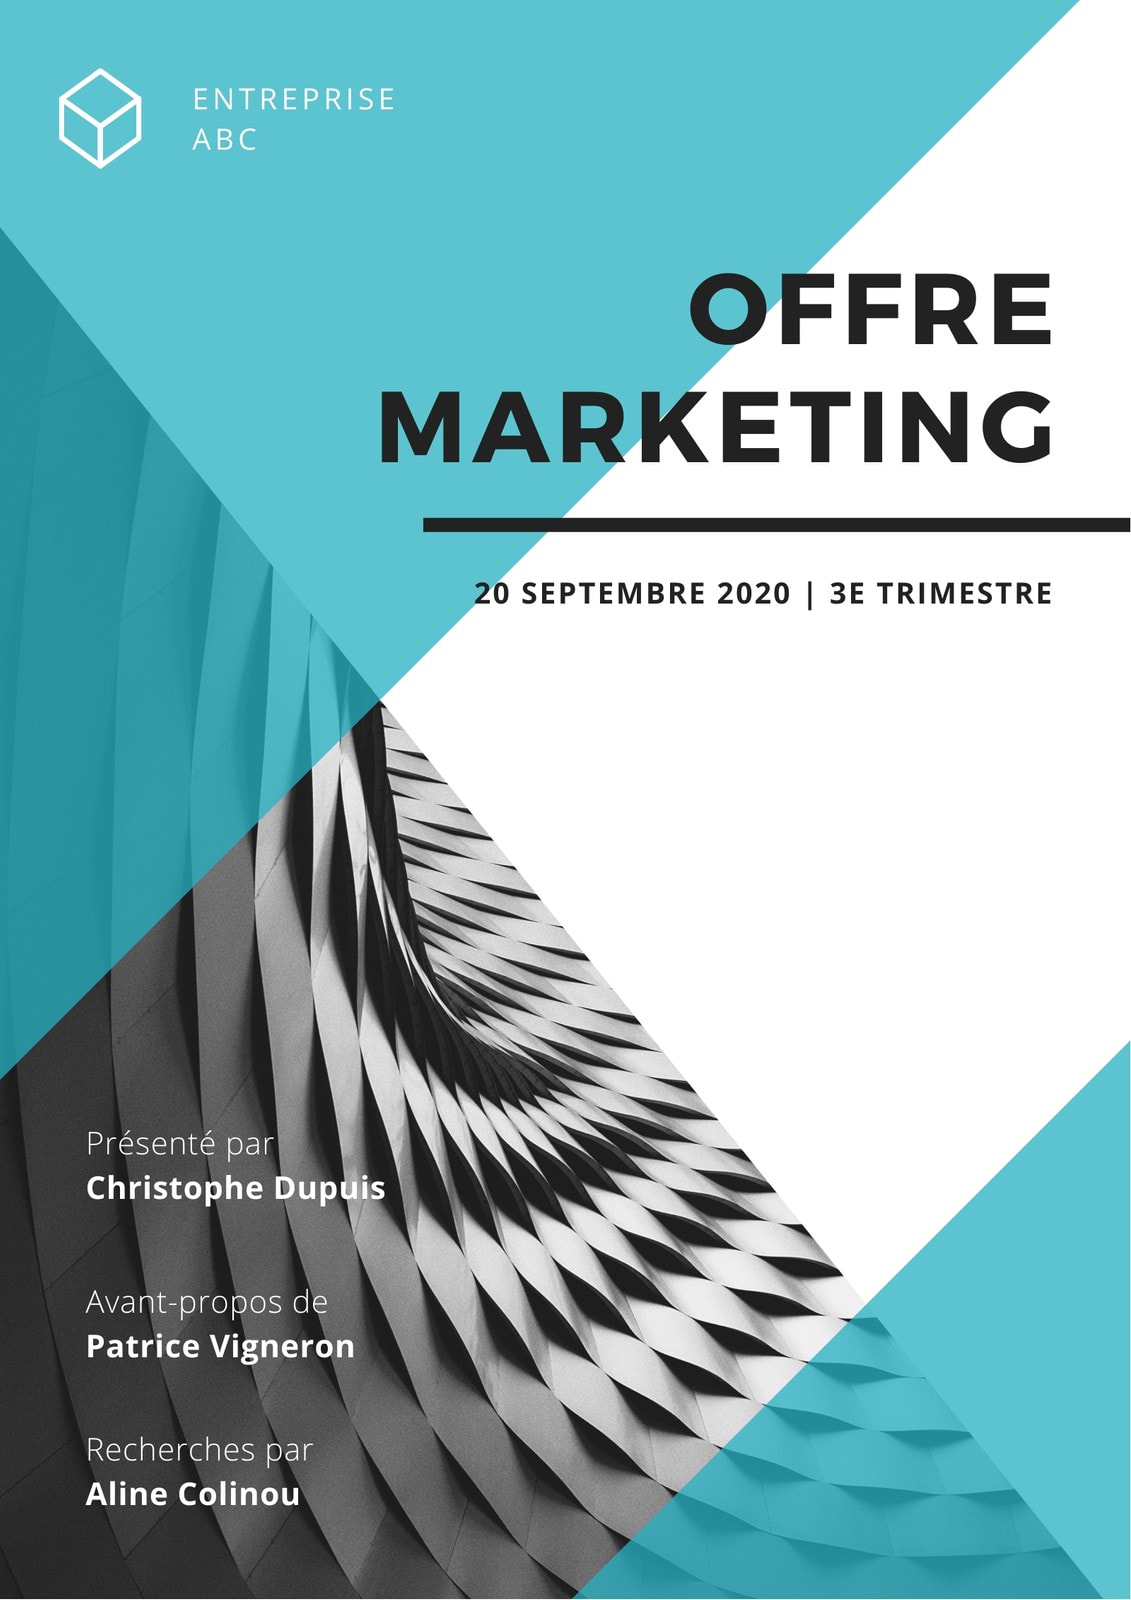 Bleu et Blanc Triangle Forme Marketing Offre